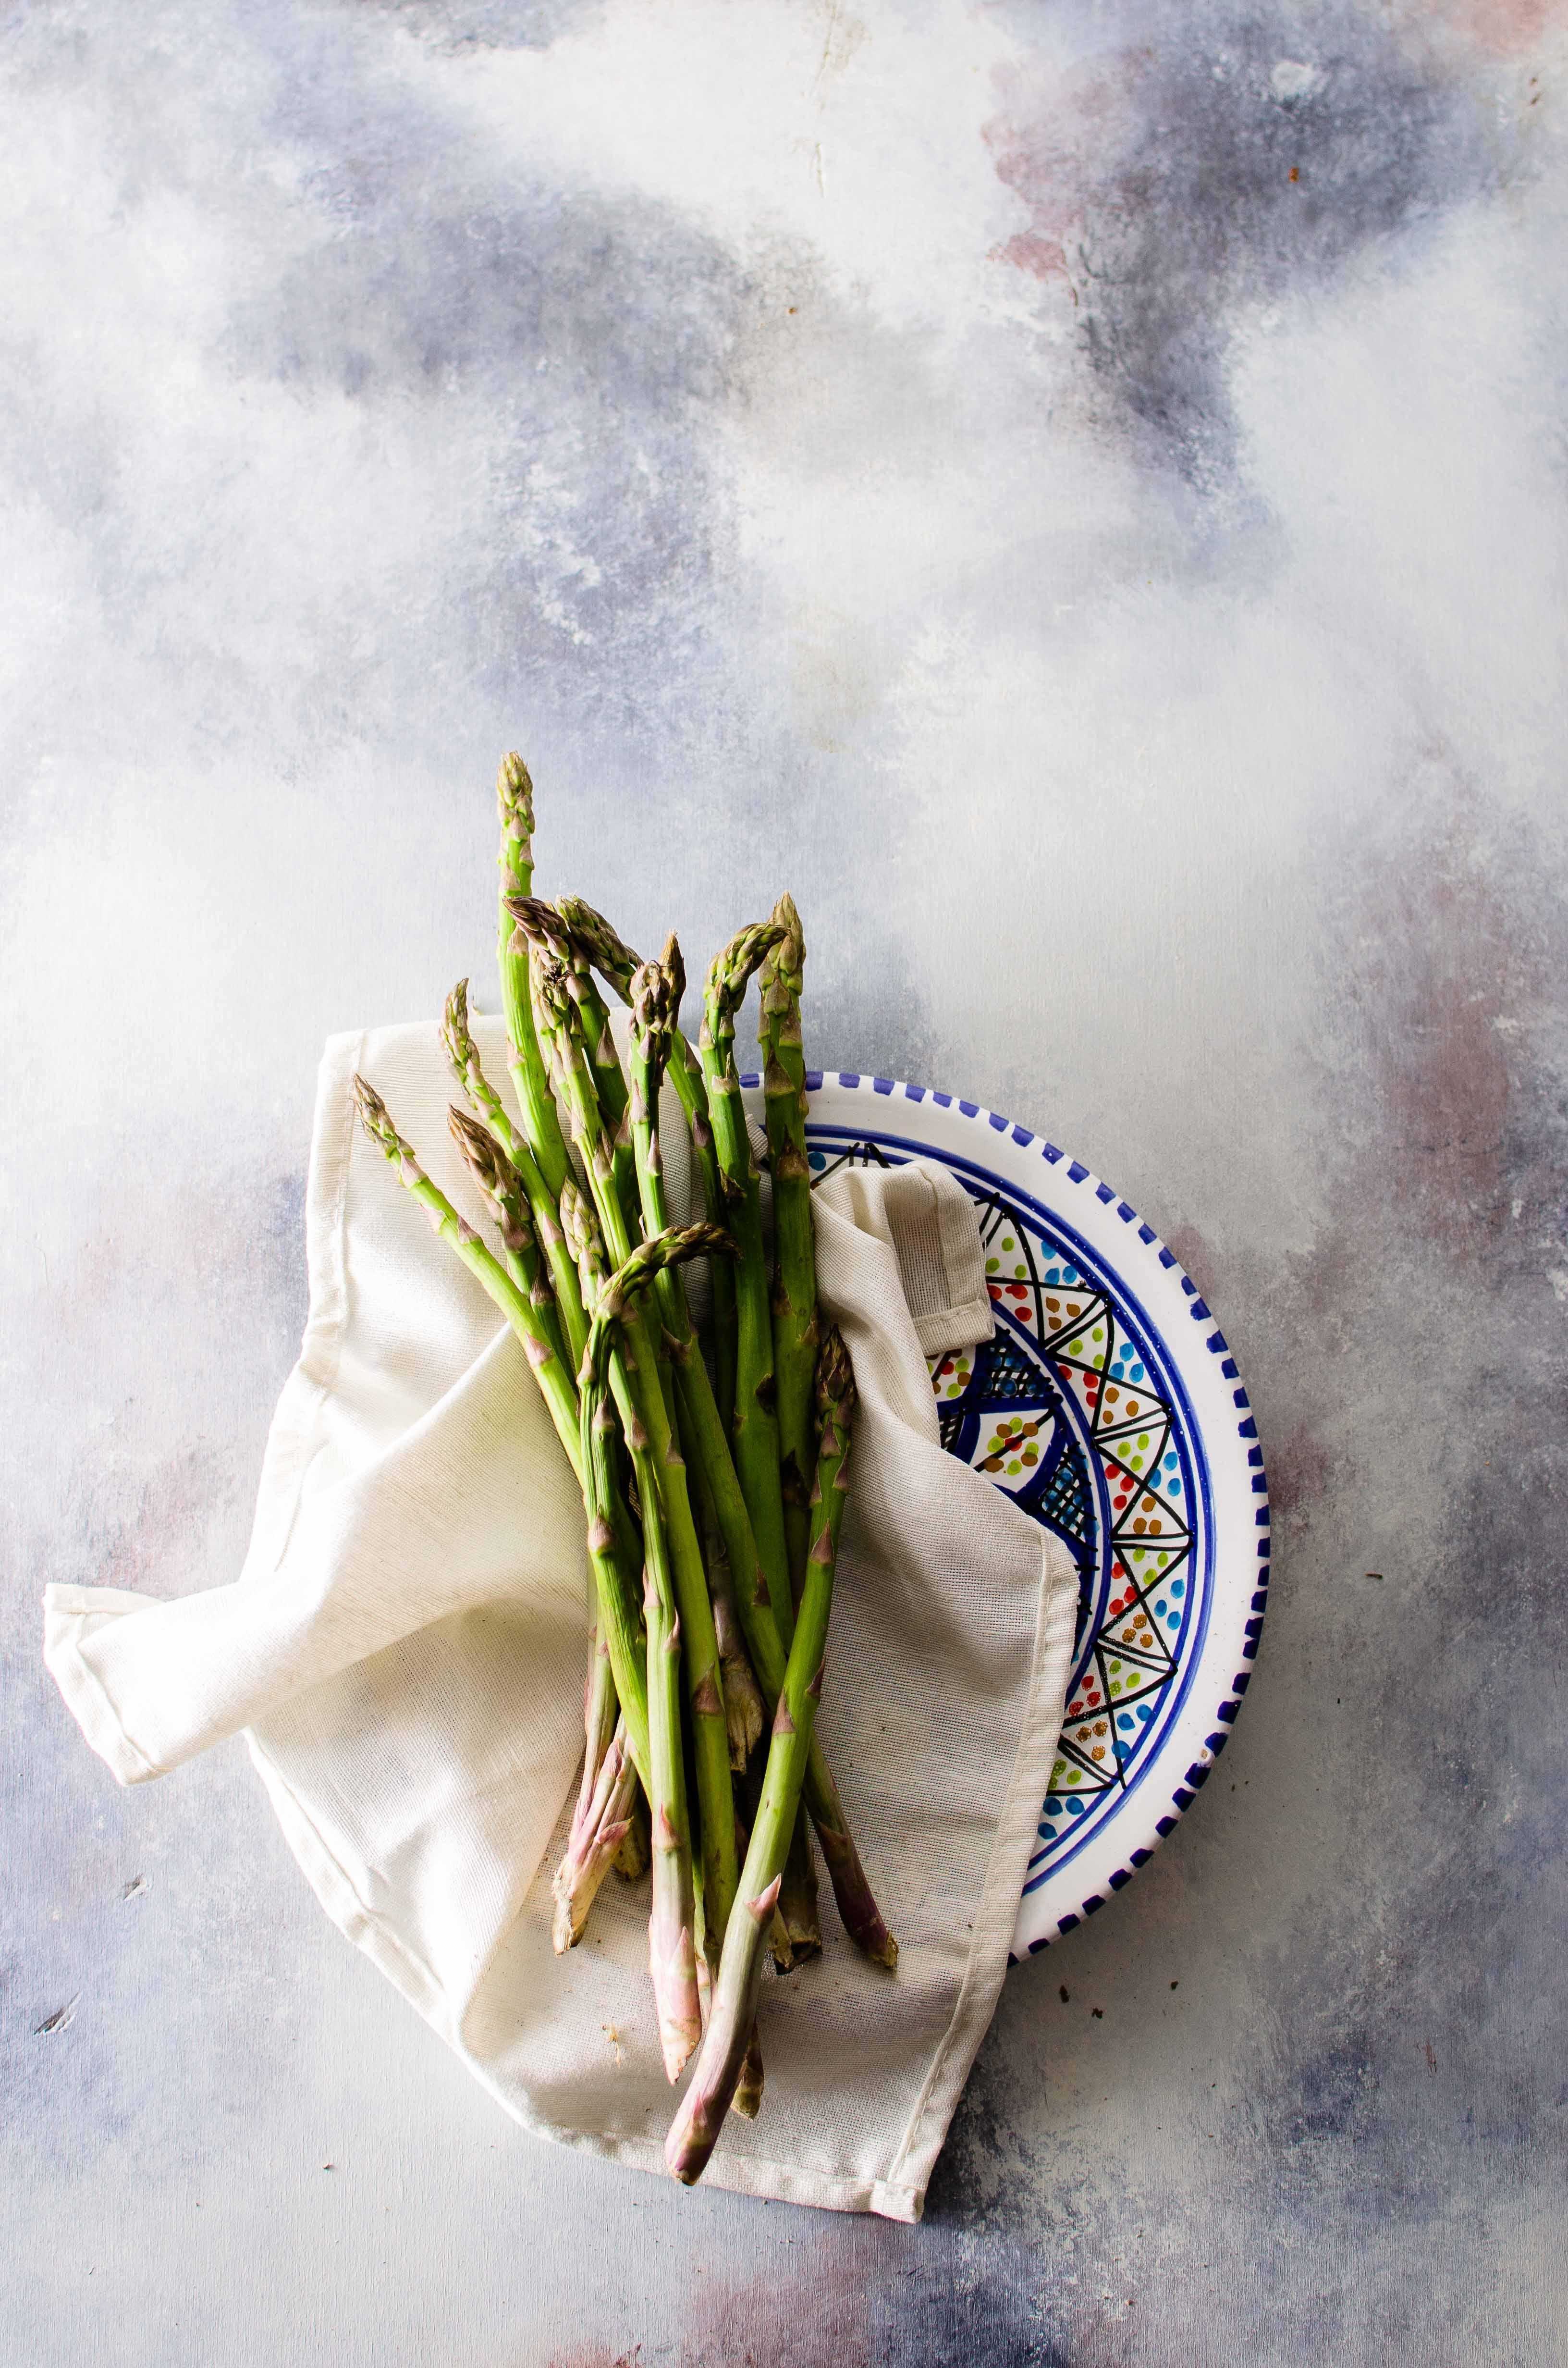 asparagi Quinoa, noodles di zucchine ed asparagi